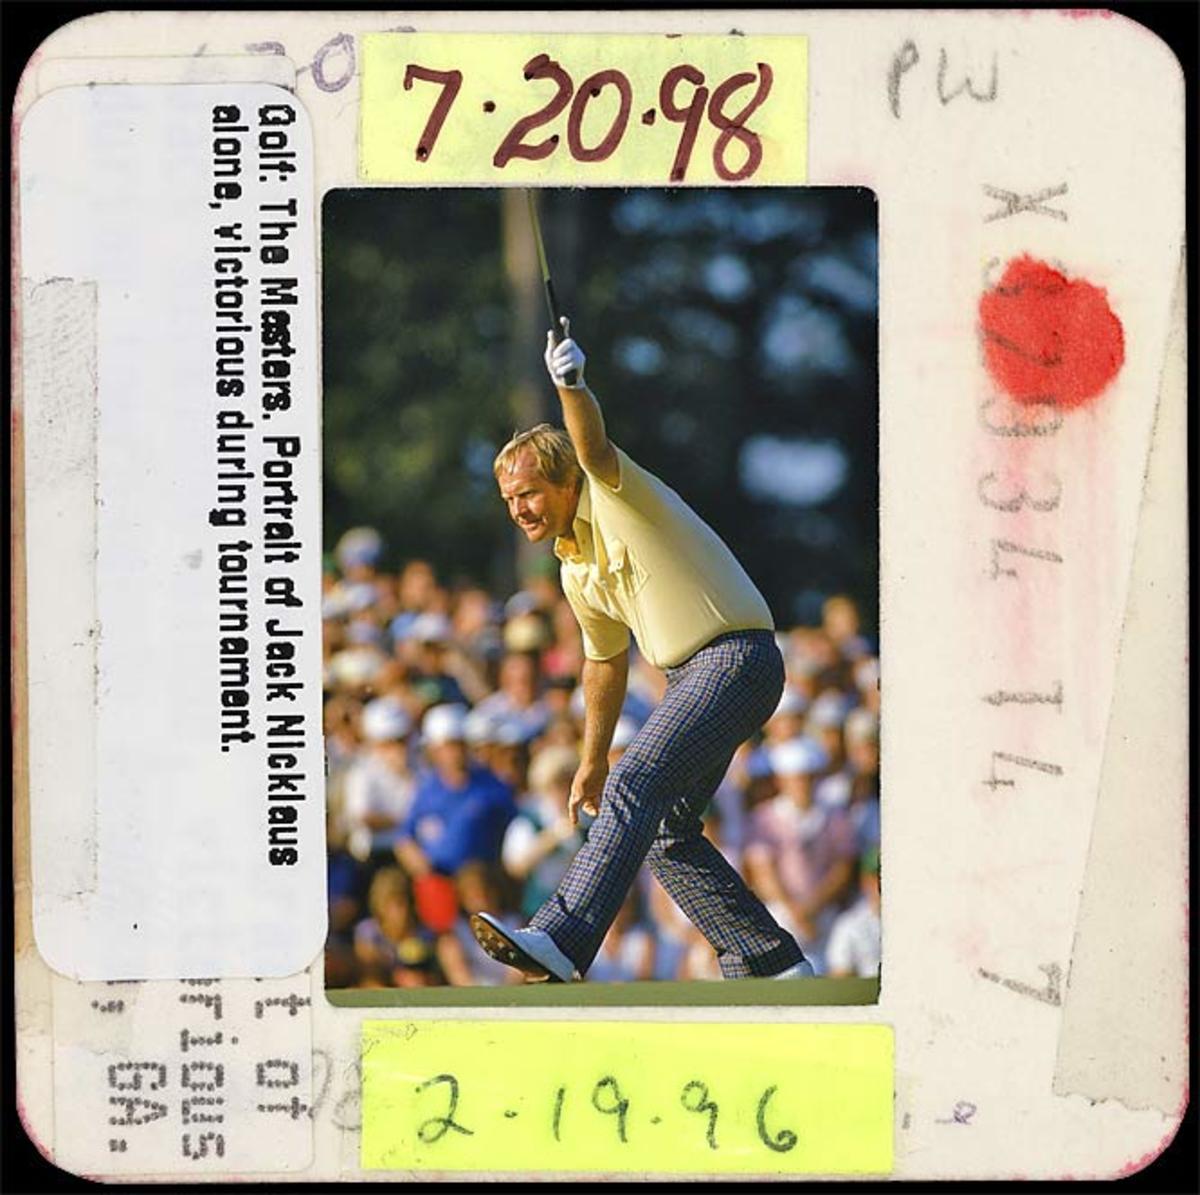 Jack Nicklaus Wins 1986 Masters